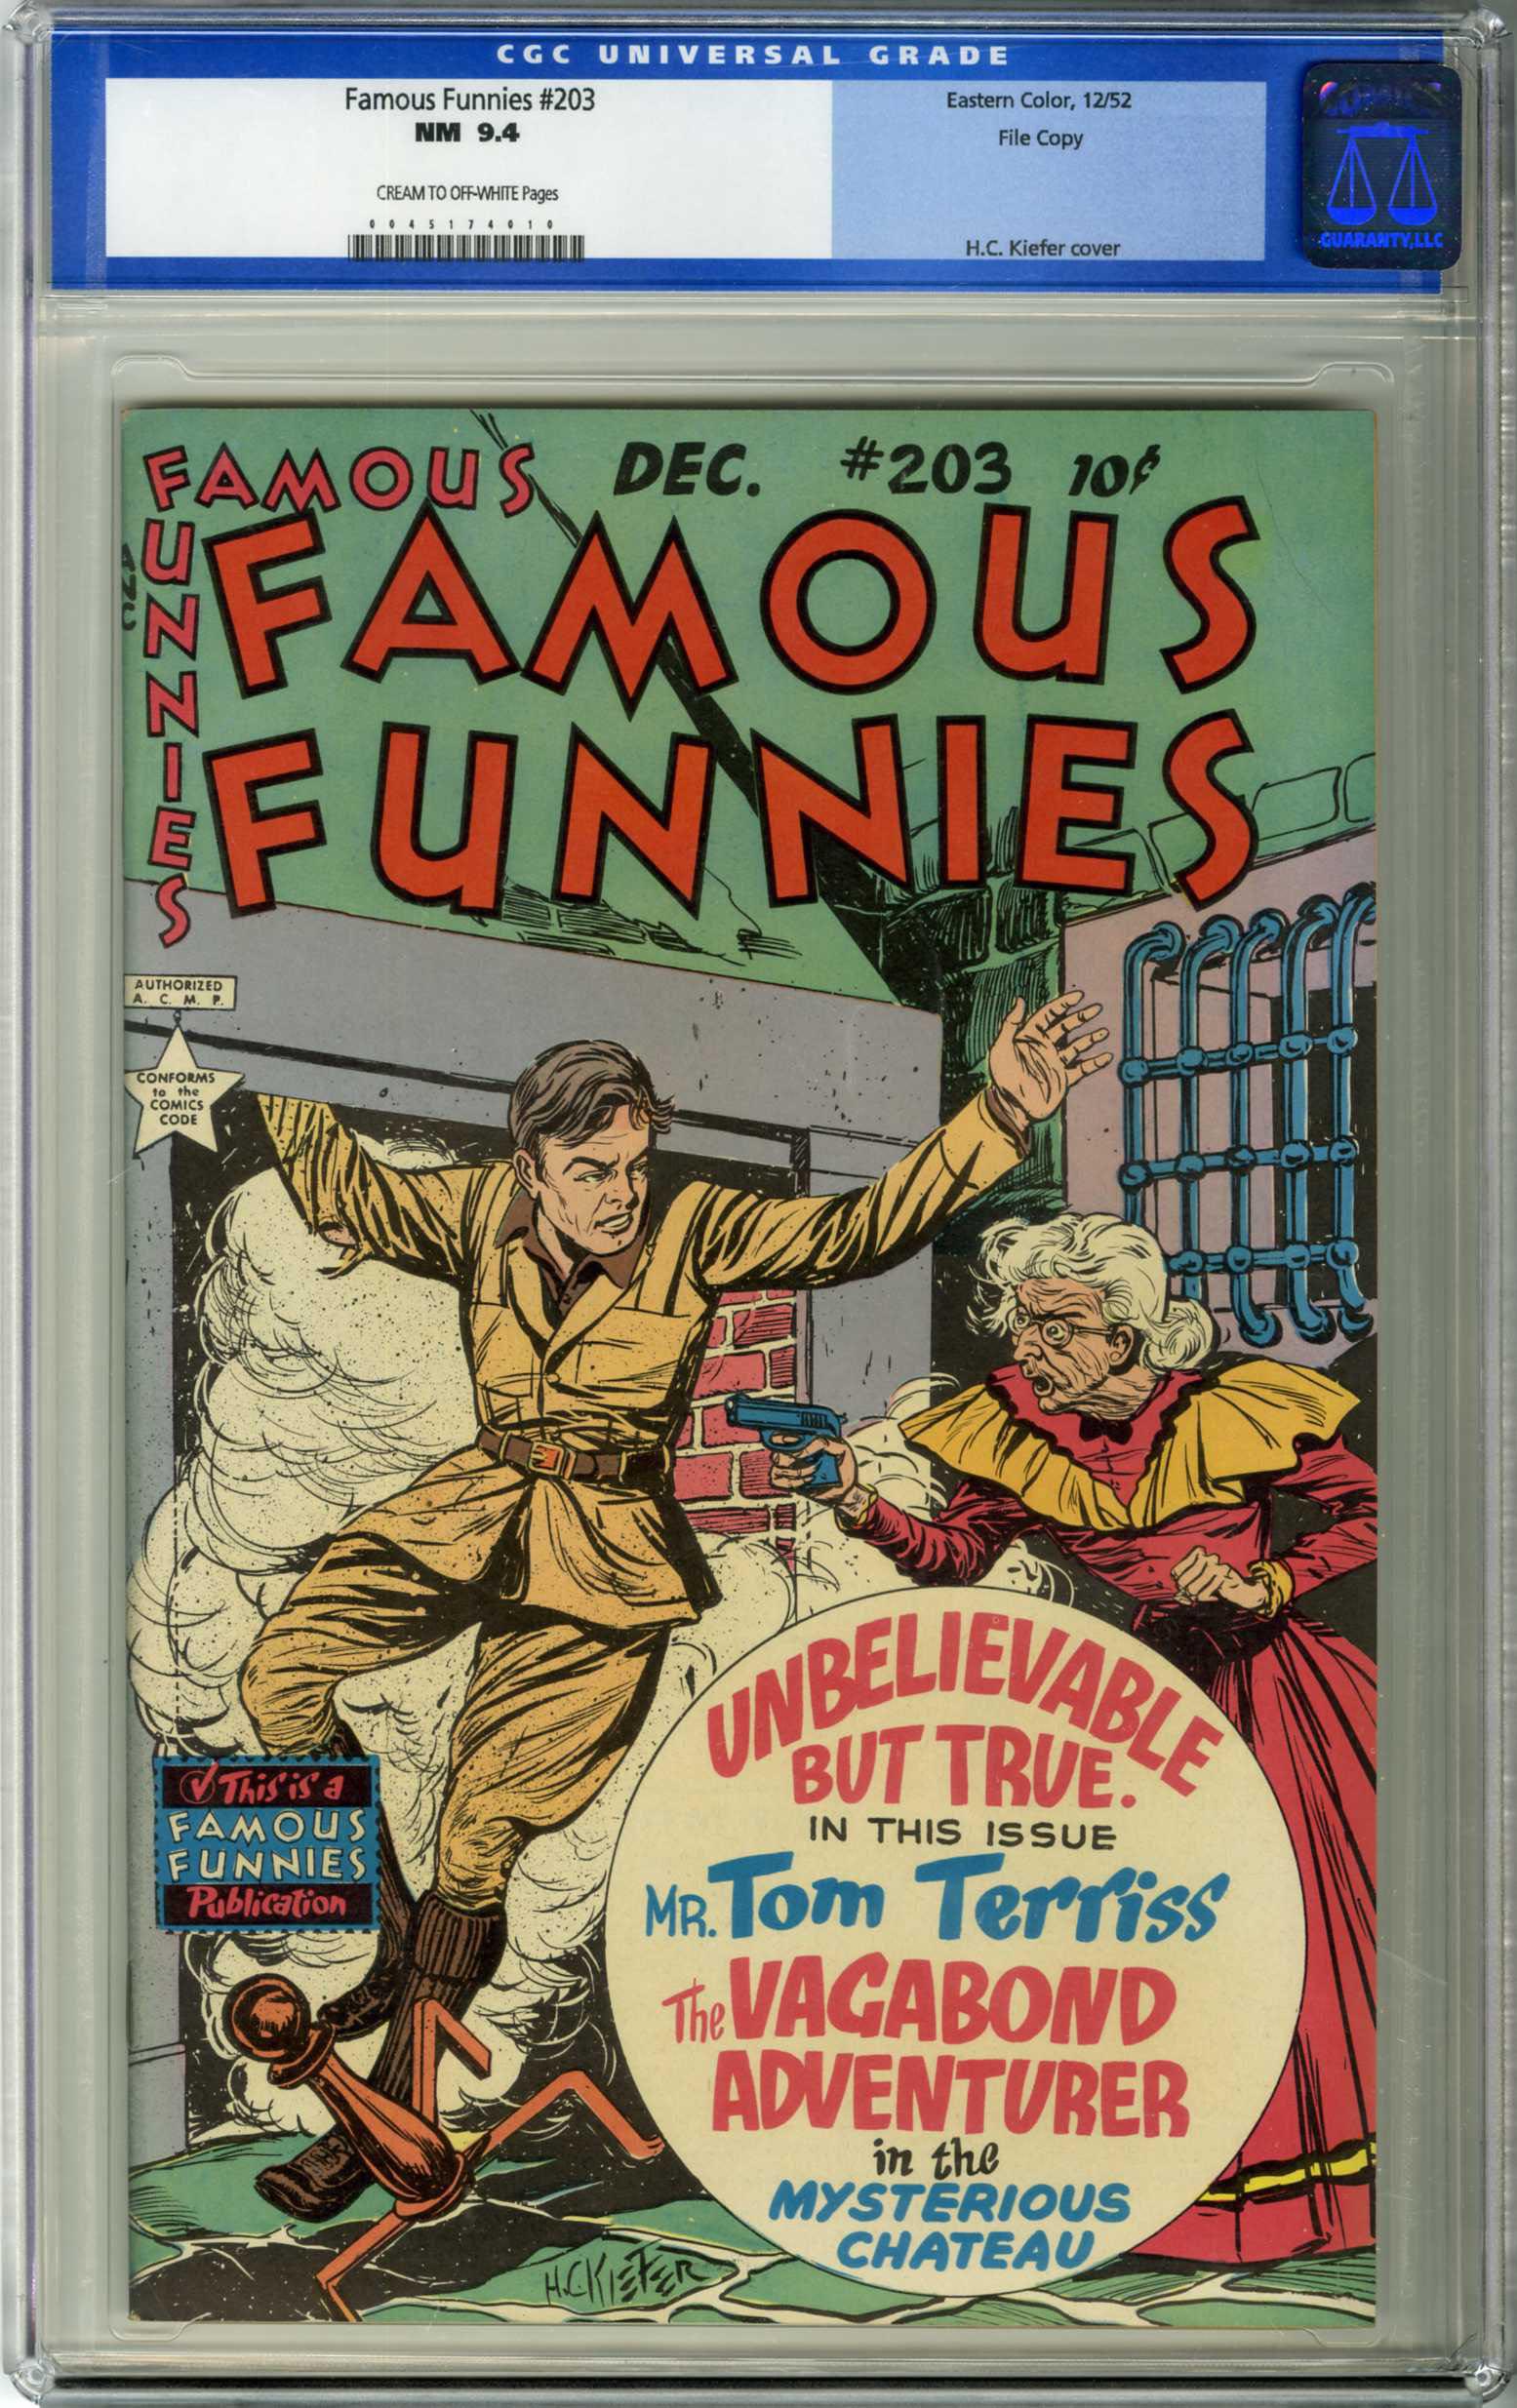 FAMOUS FUNNIES #203 (1952) CGC NM 9.4 COW Pages / FILE COPY / H.C. KIEFER COVER